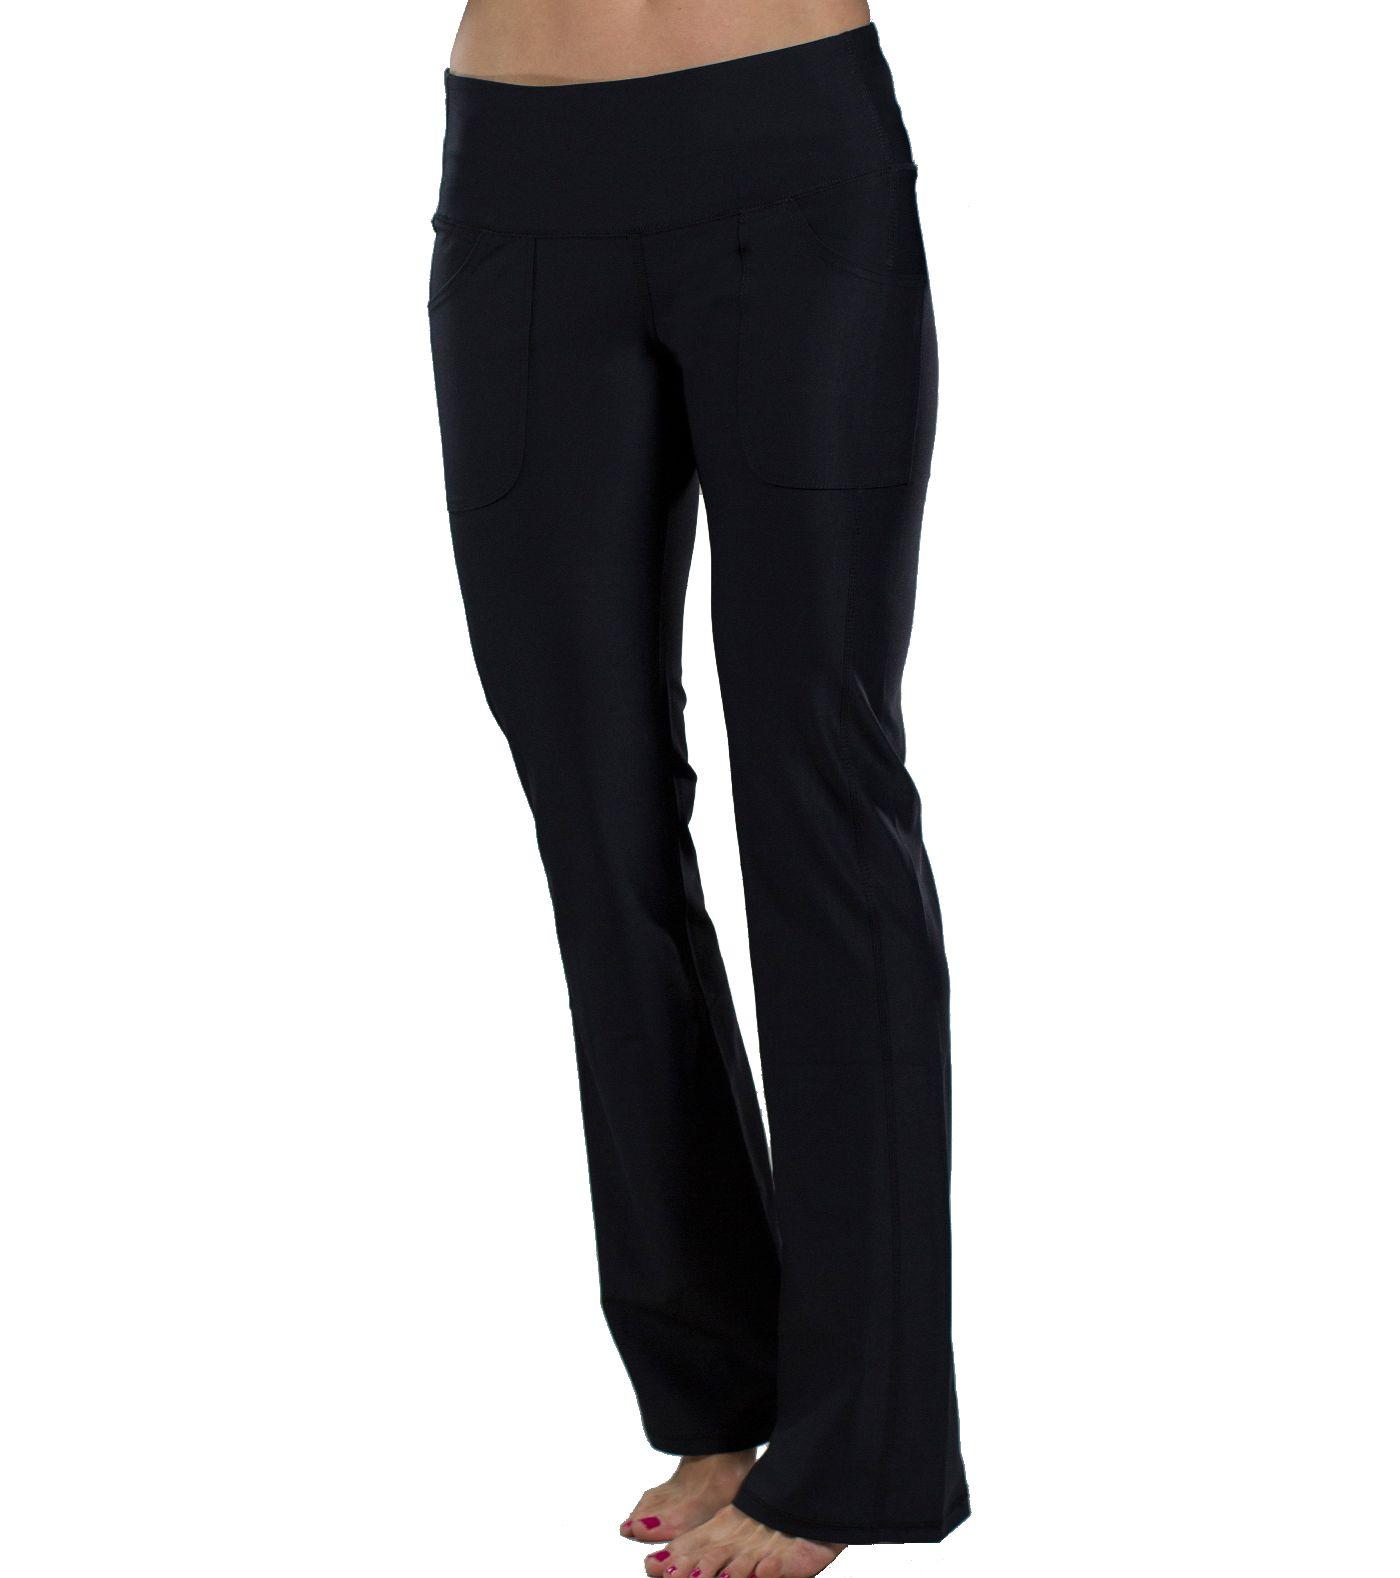 Jofit Women's Live In Golf Pants